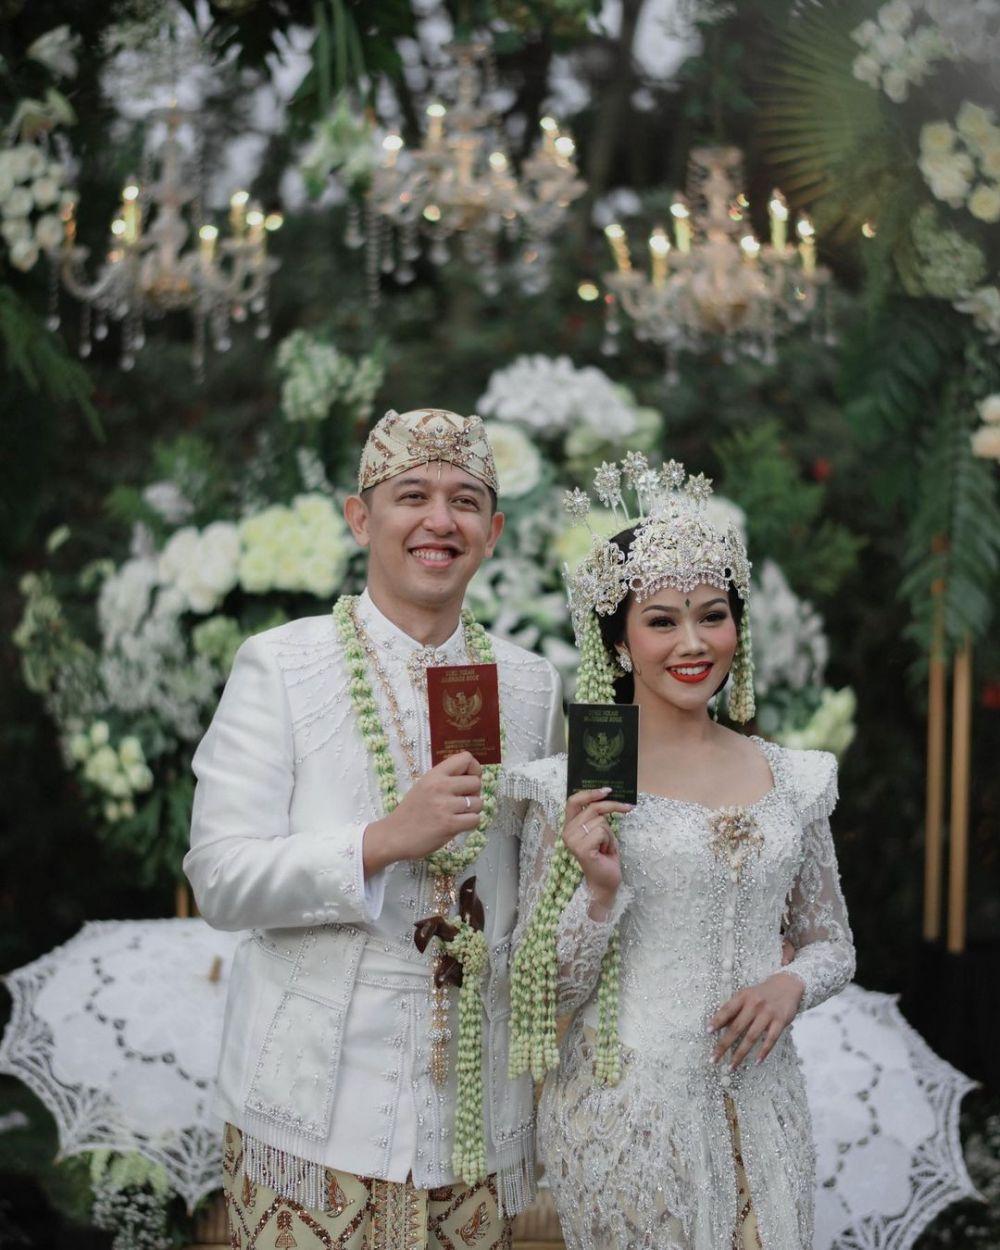 Mahar artis saat menikah 2020 © 2020 brilio.net